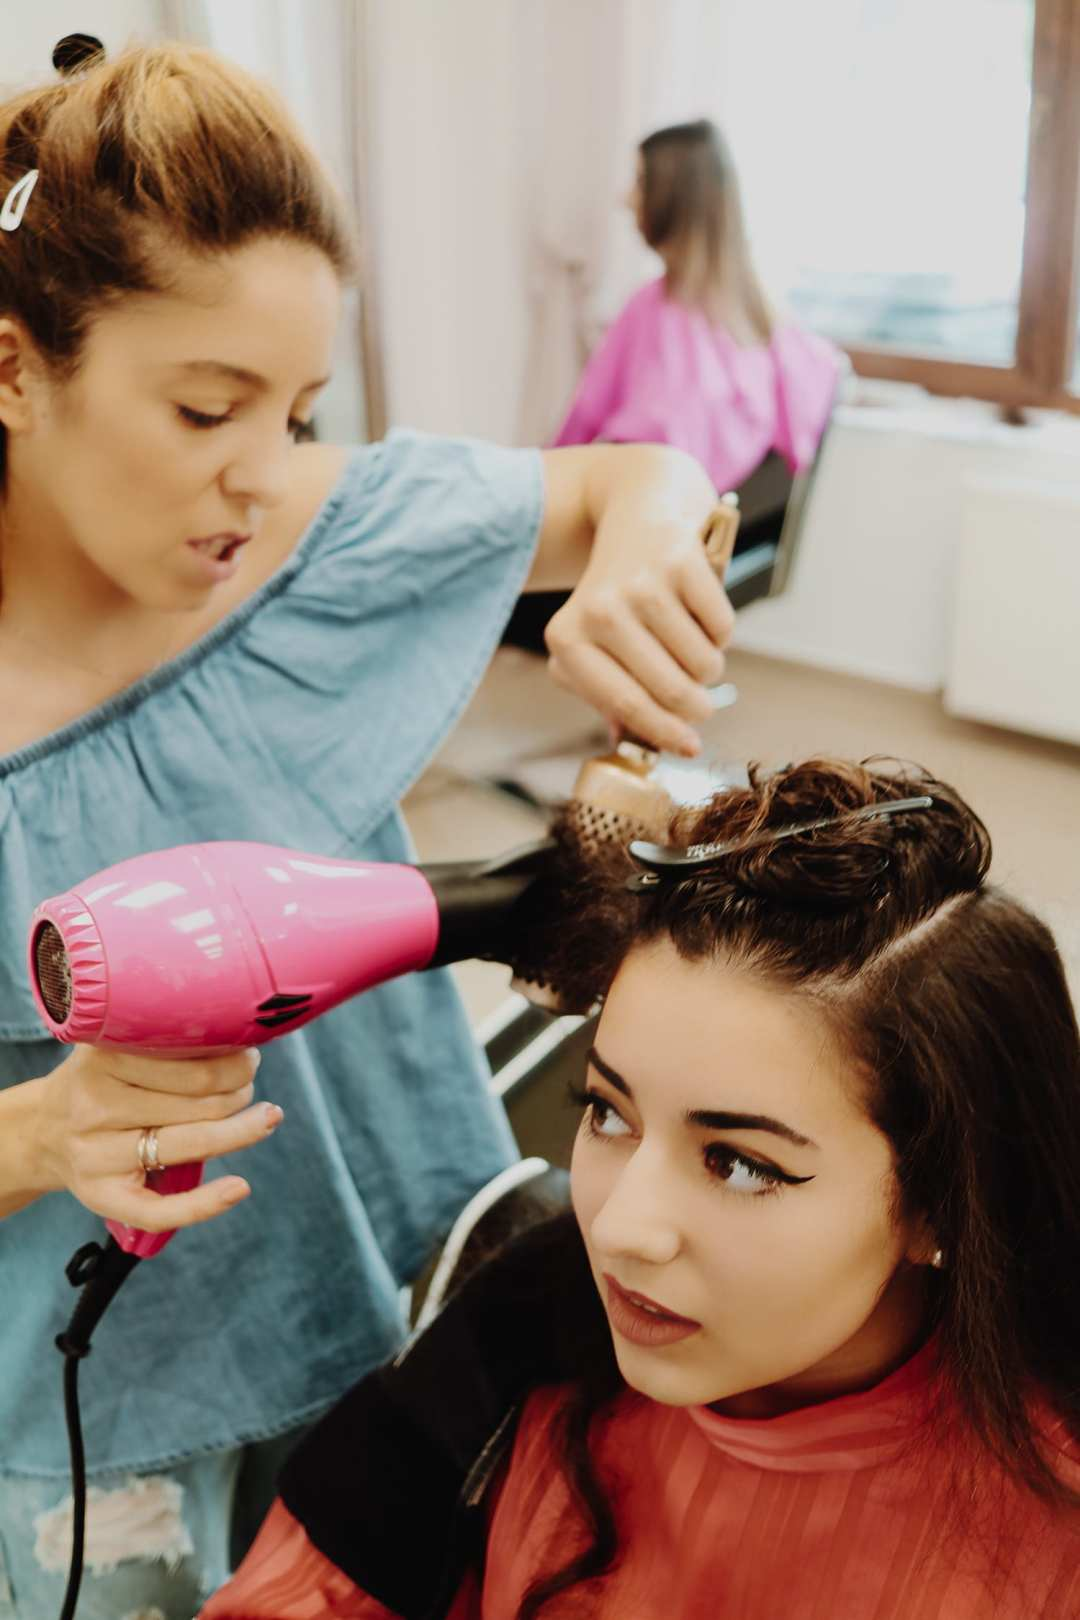 londa professional fiber infusion pret salon roxi rose tratament cheratina par cret efecte keratina pareri review beauty blog romania timisoara fashion lstudio timisoara laura jivan (53)